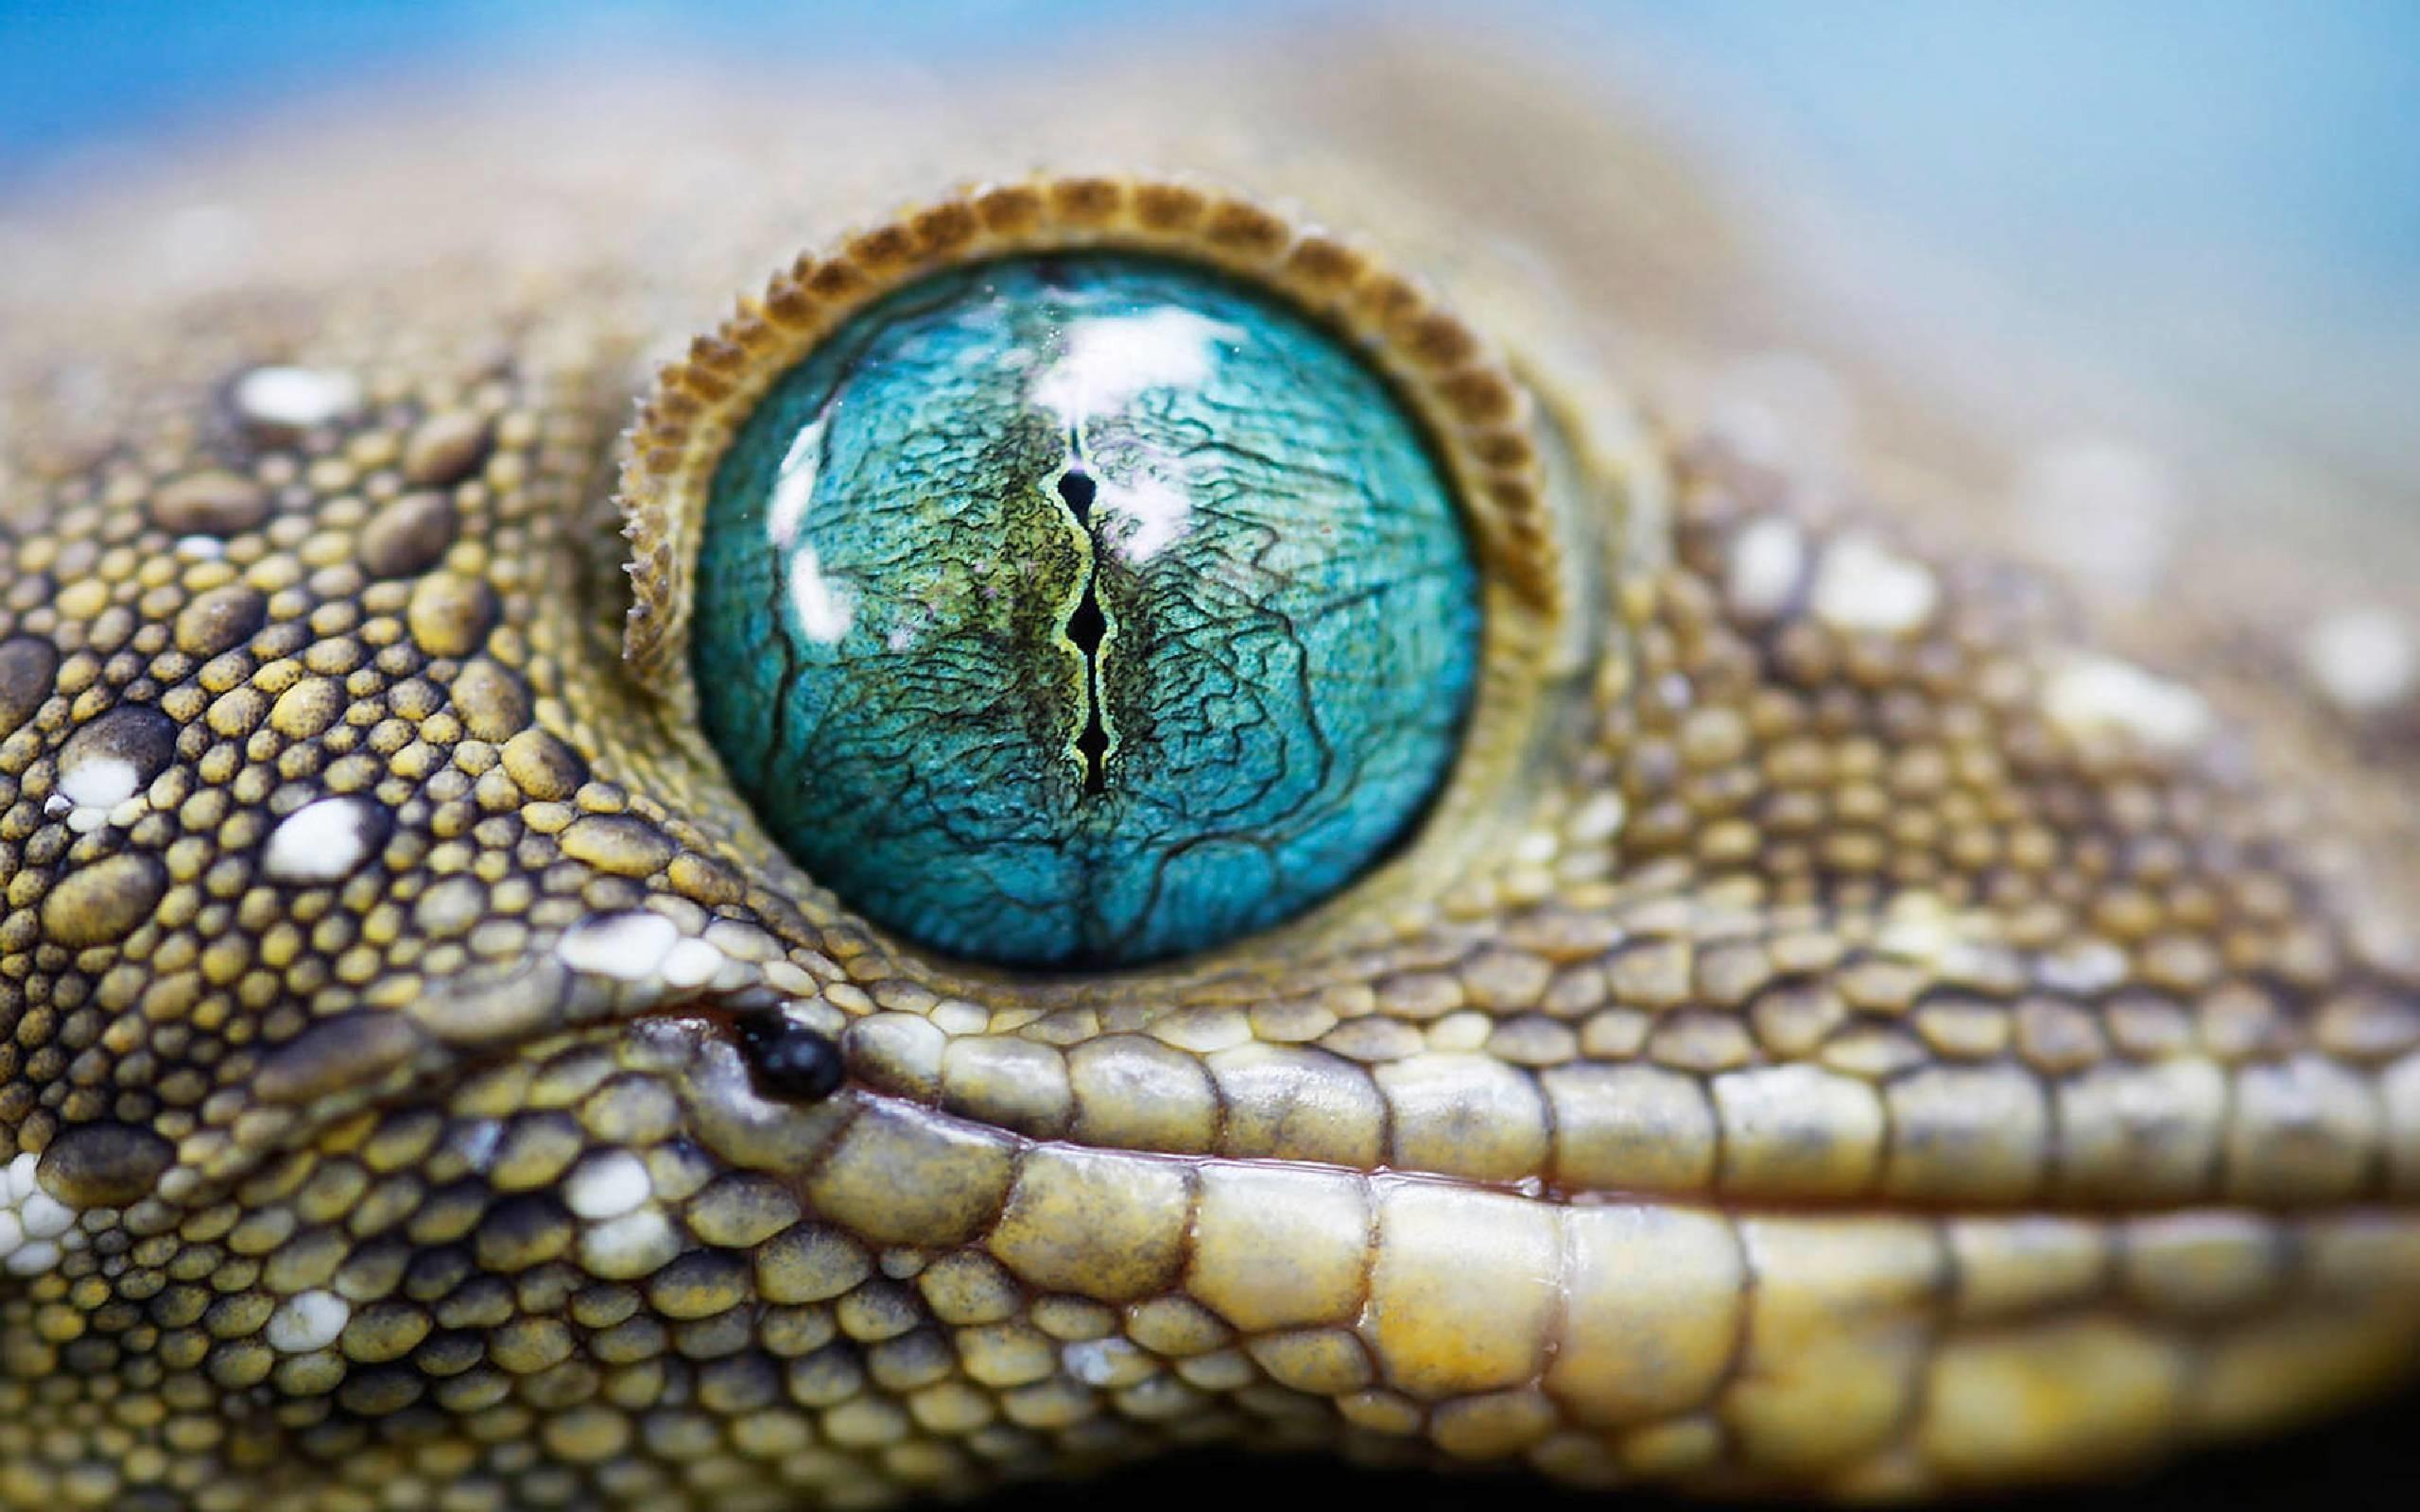 Beautiful Wallpaper Marvel Lizard - 1044328-beautiful-lizard-wallpaper-2560x1600  You Should Have_113615.jpg